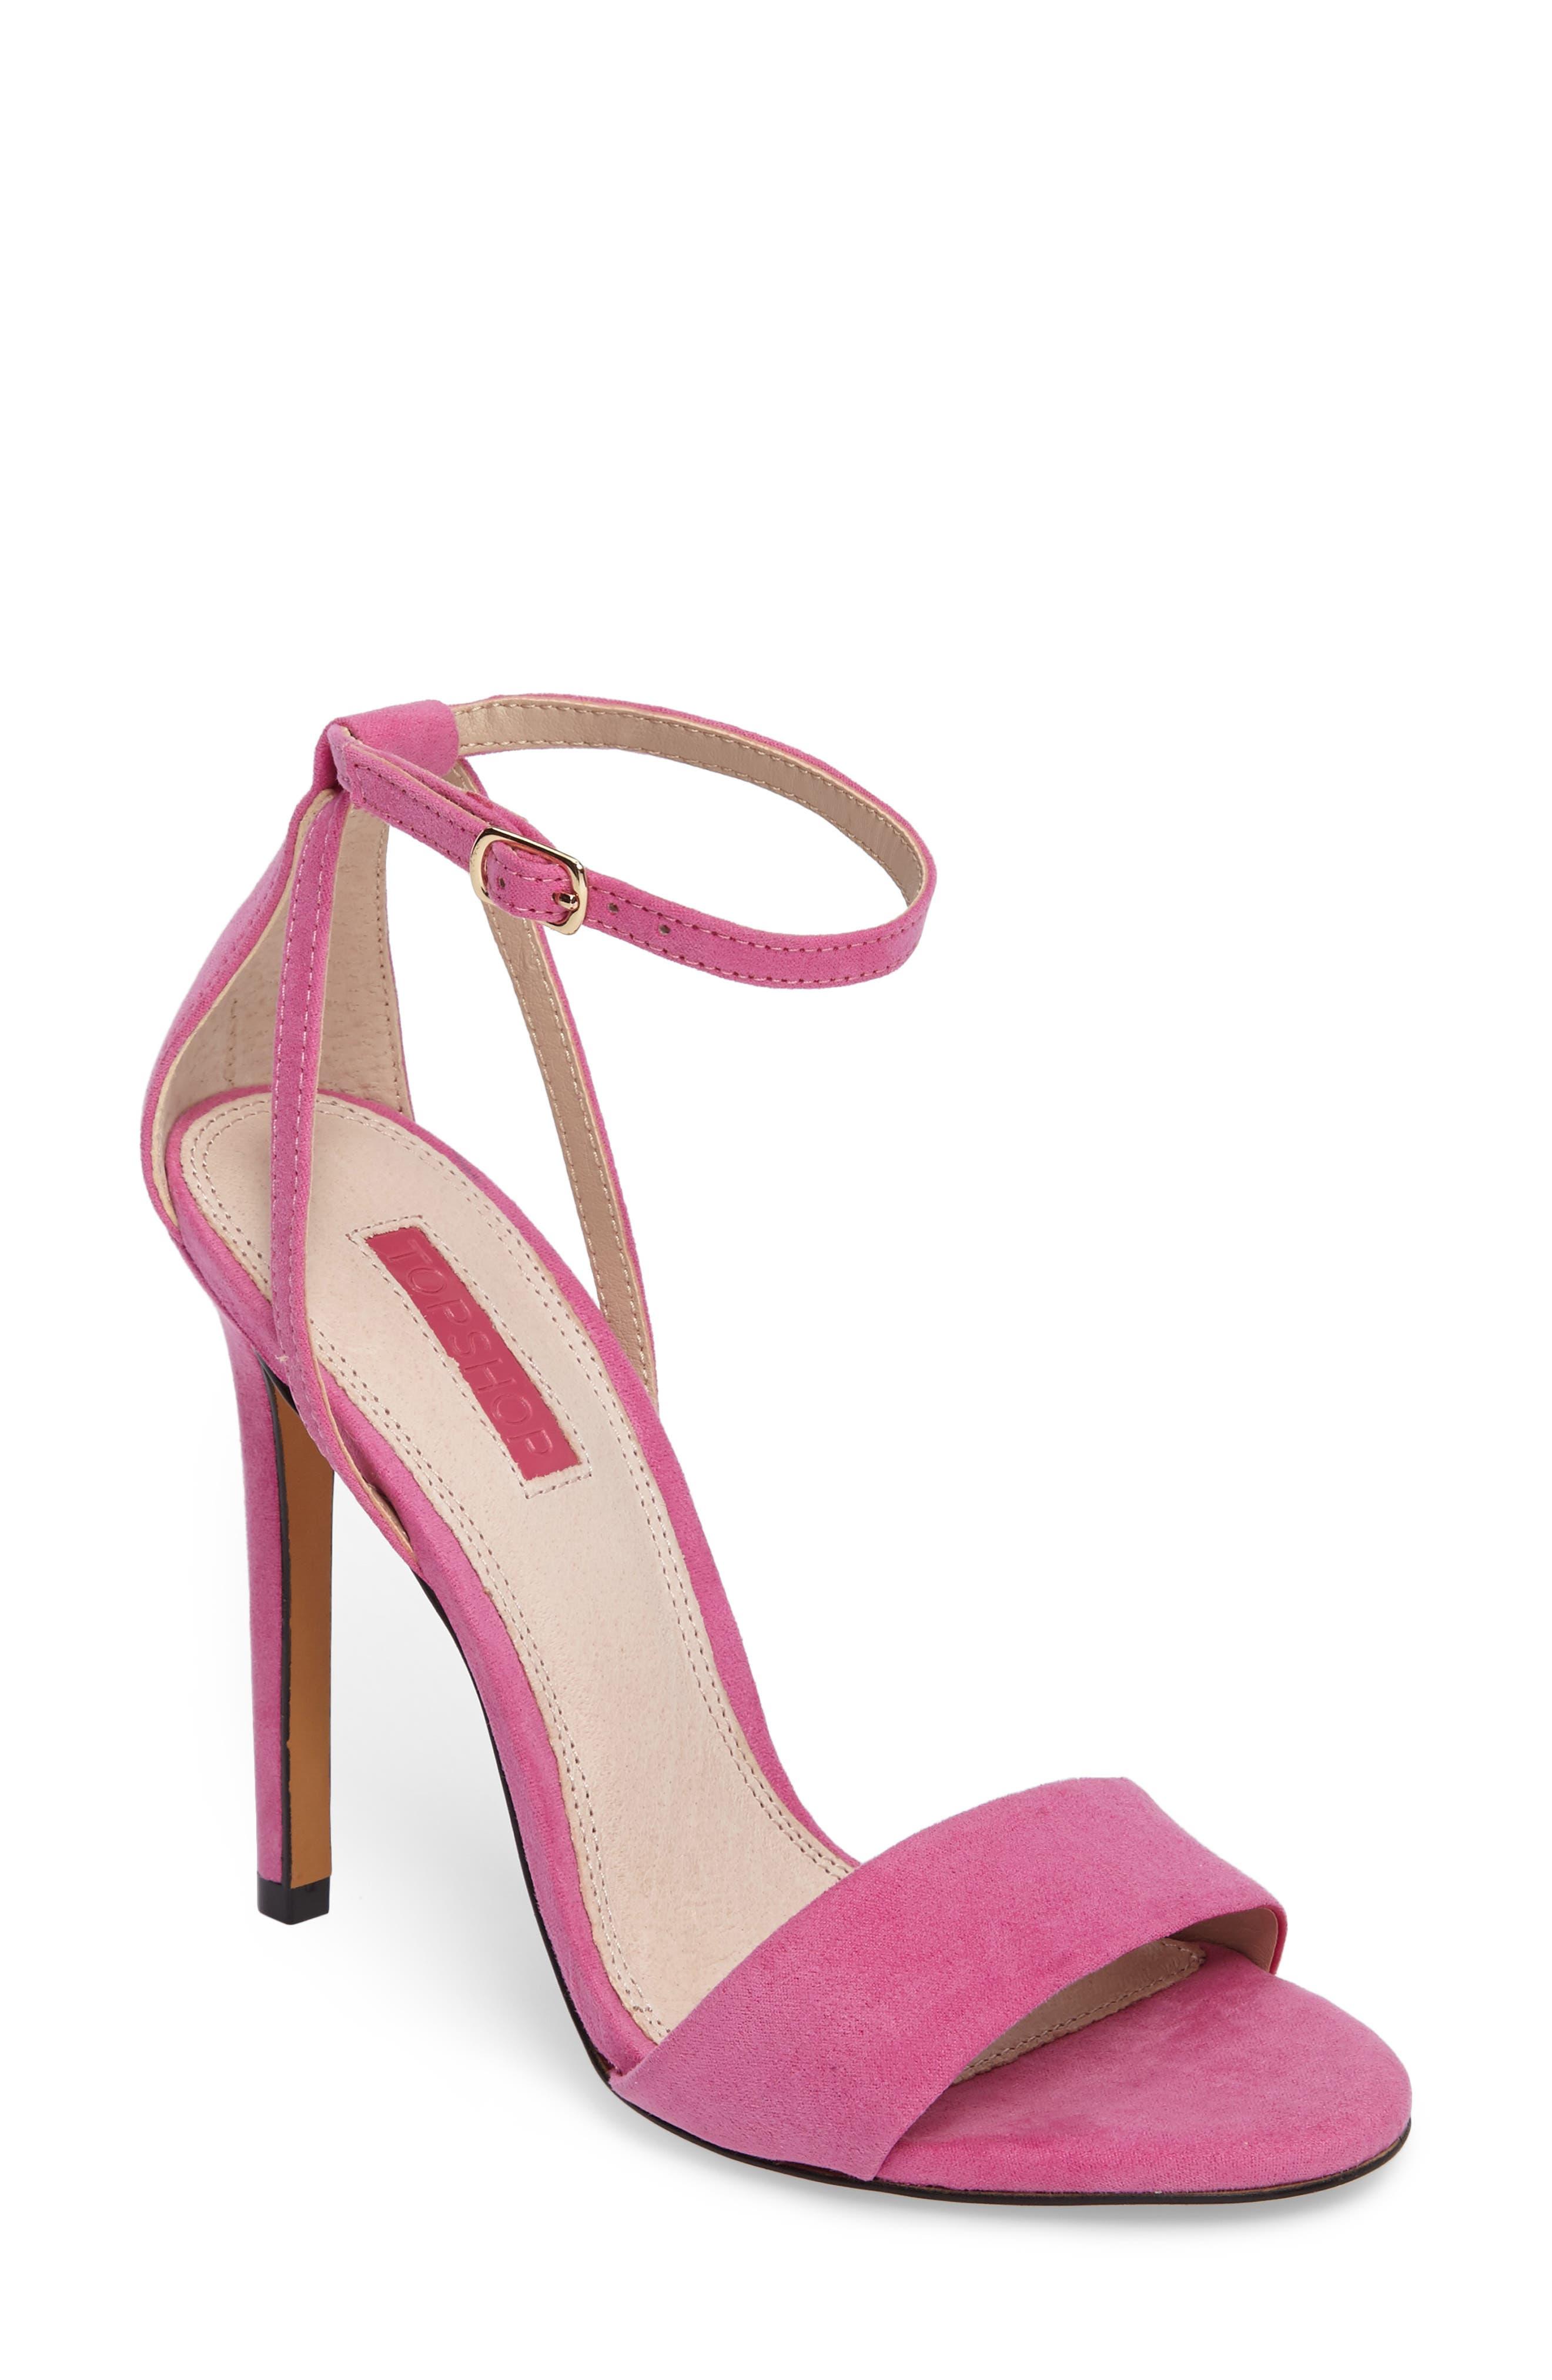 Main Image - Topshop Raphael New Genuine Calf Hair Sandal (Women)